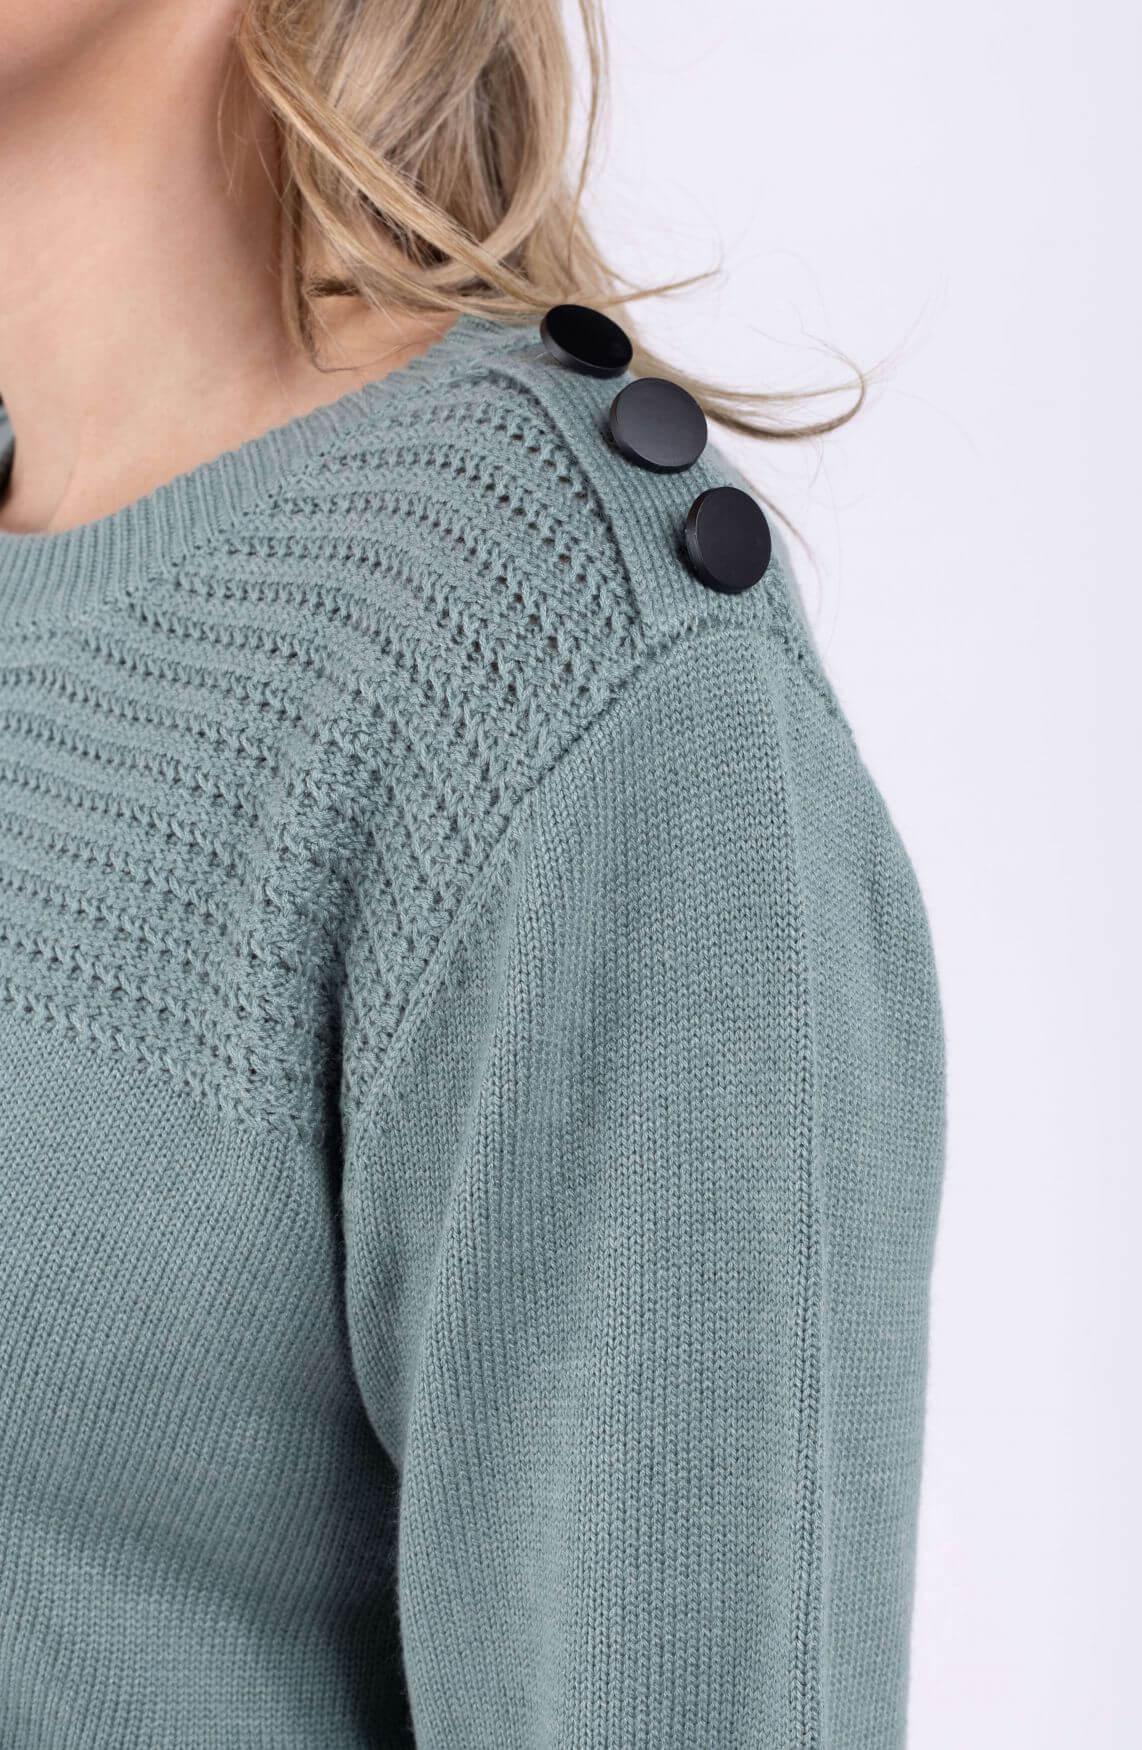 Anna Dames Pullover met sierknopen Groen